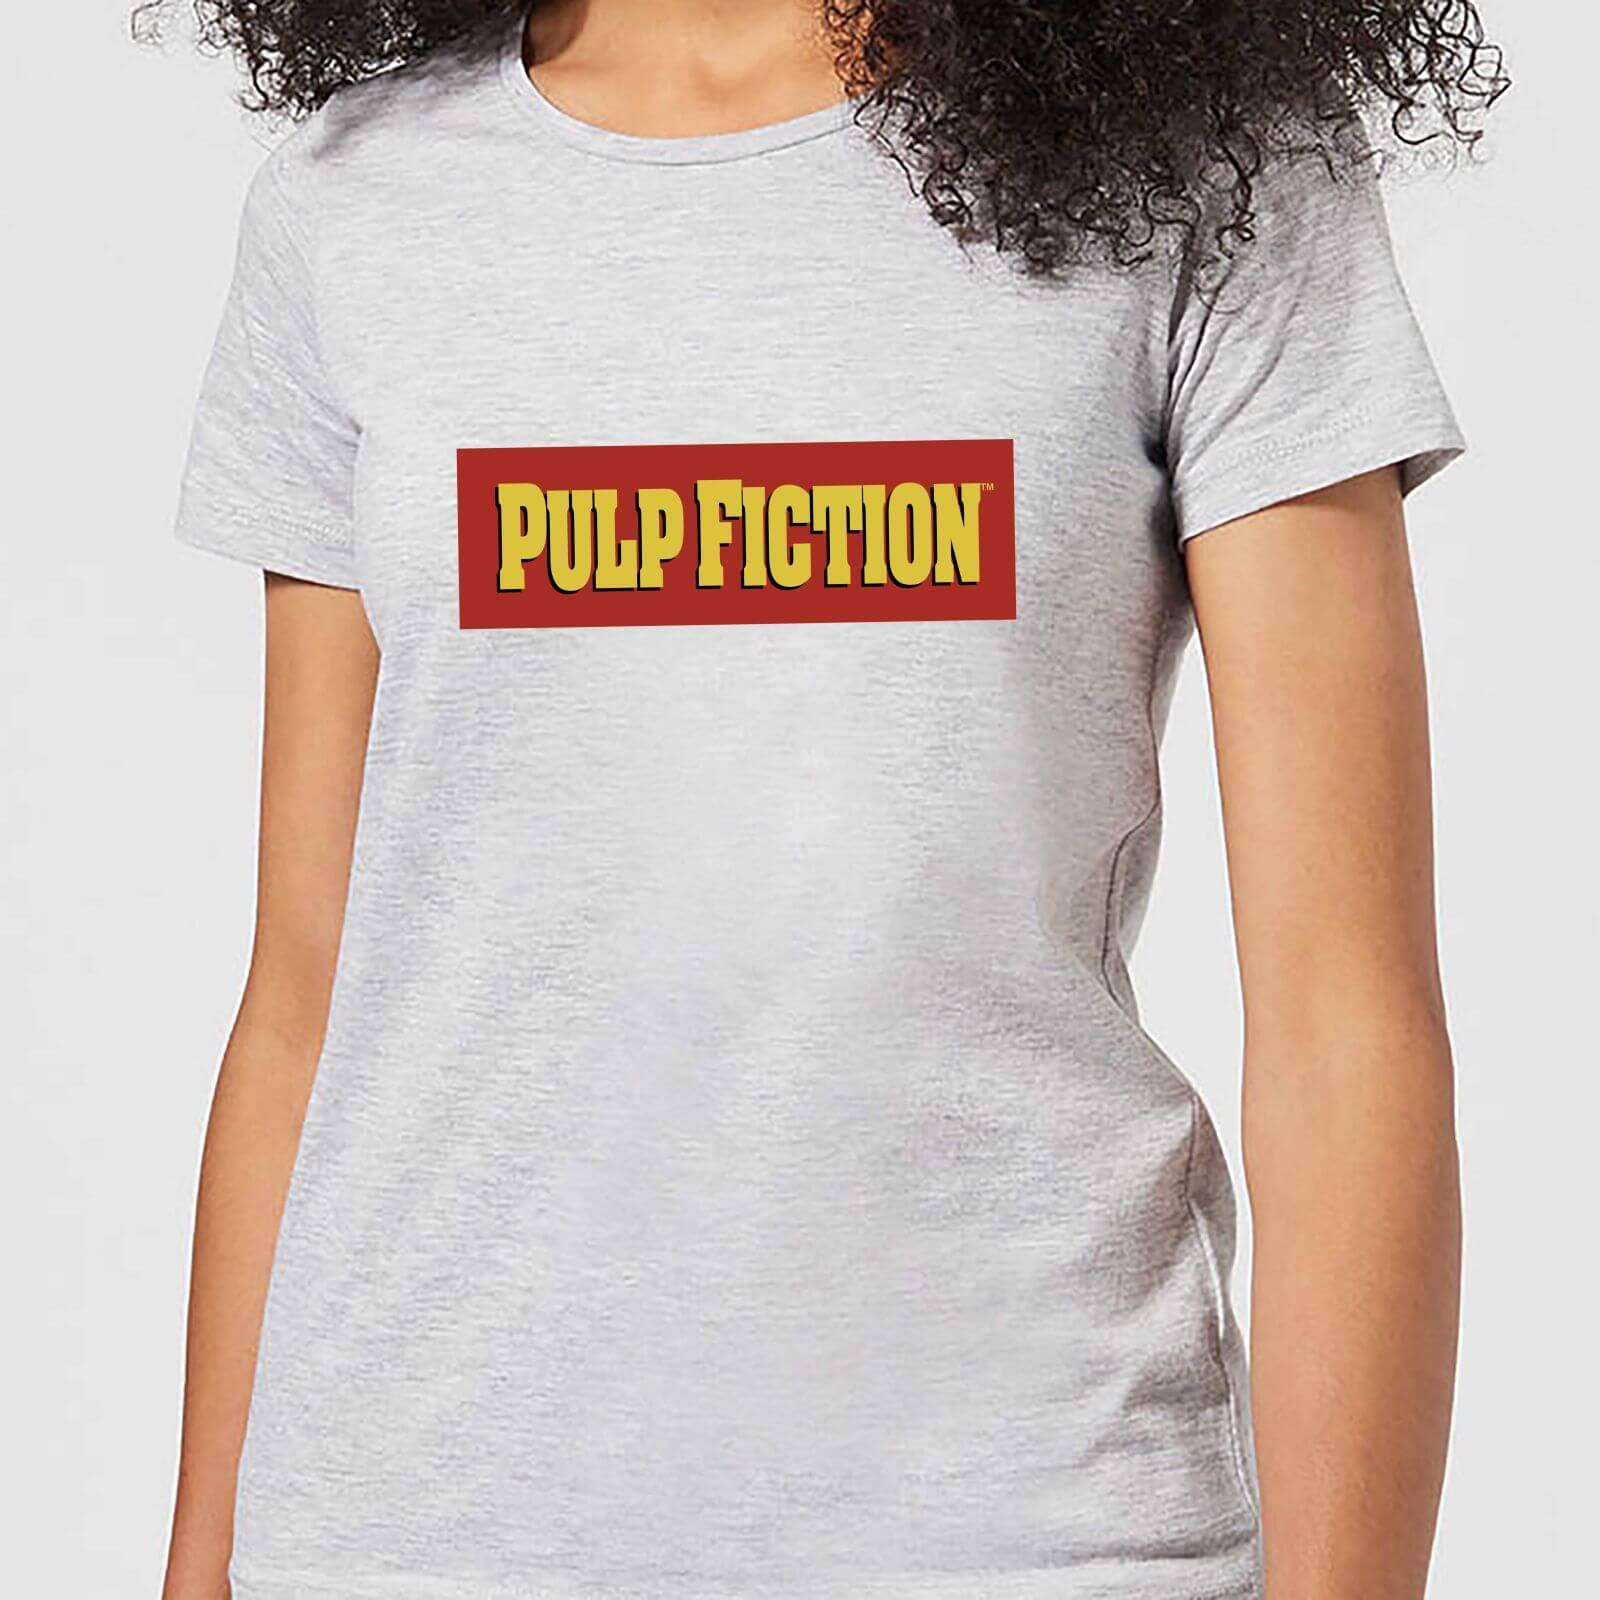 OfferteWeb.click 88-pulp-fiction-logo-women-s-t-shirt-grey-xl-grigio